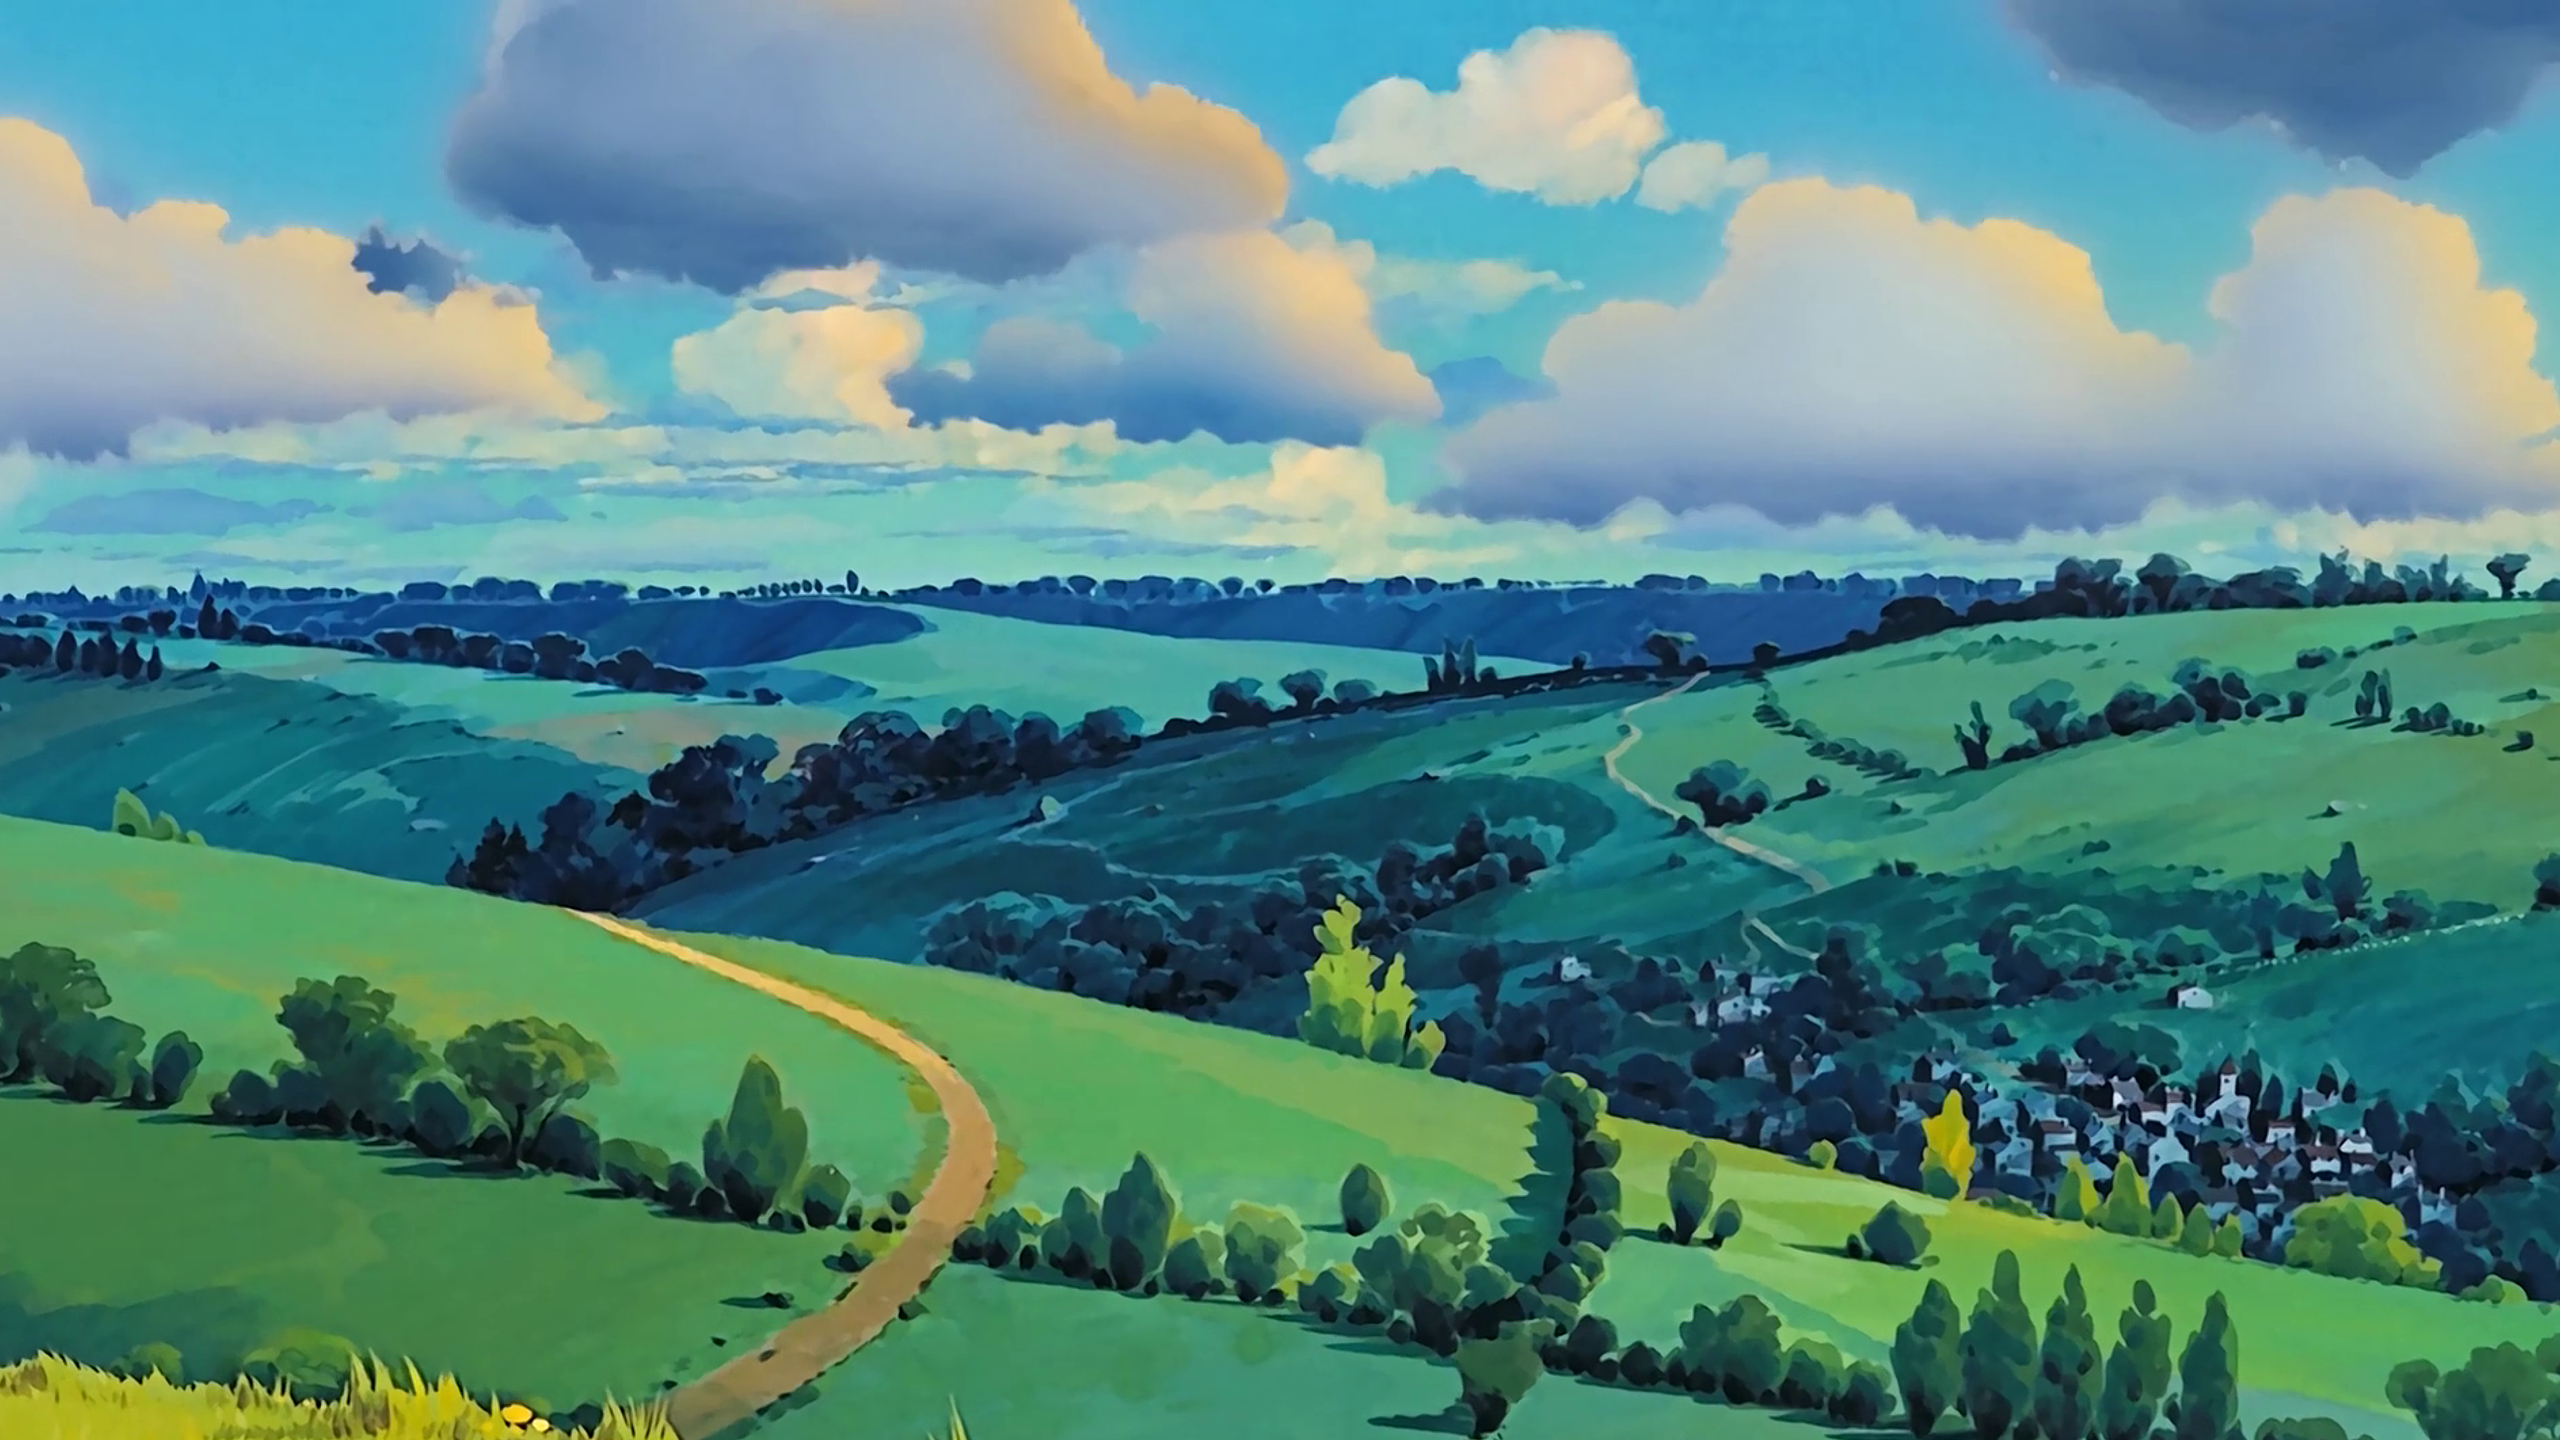 100 Studio Ghibli Wallpapers Imgur Studio Ghibli Background Anime Scenery Studio Ghibli